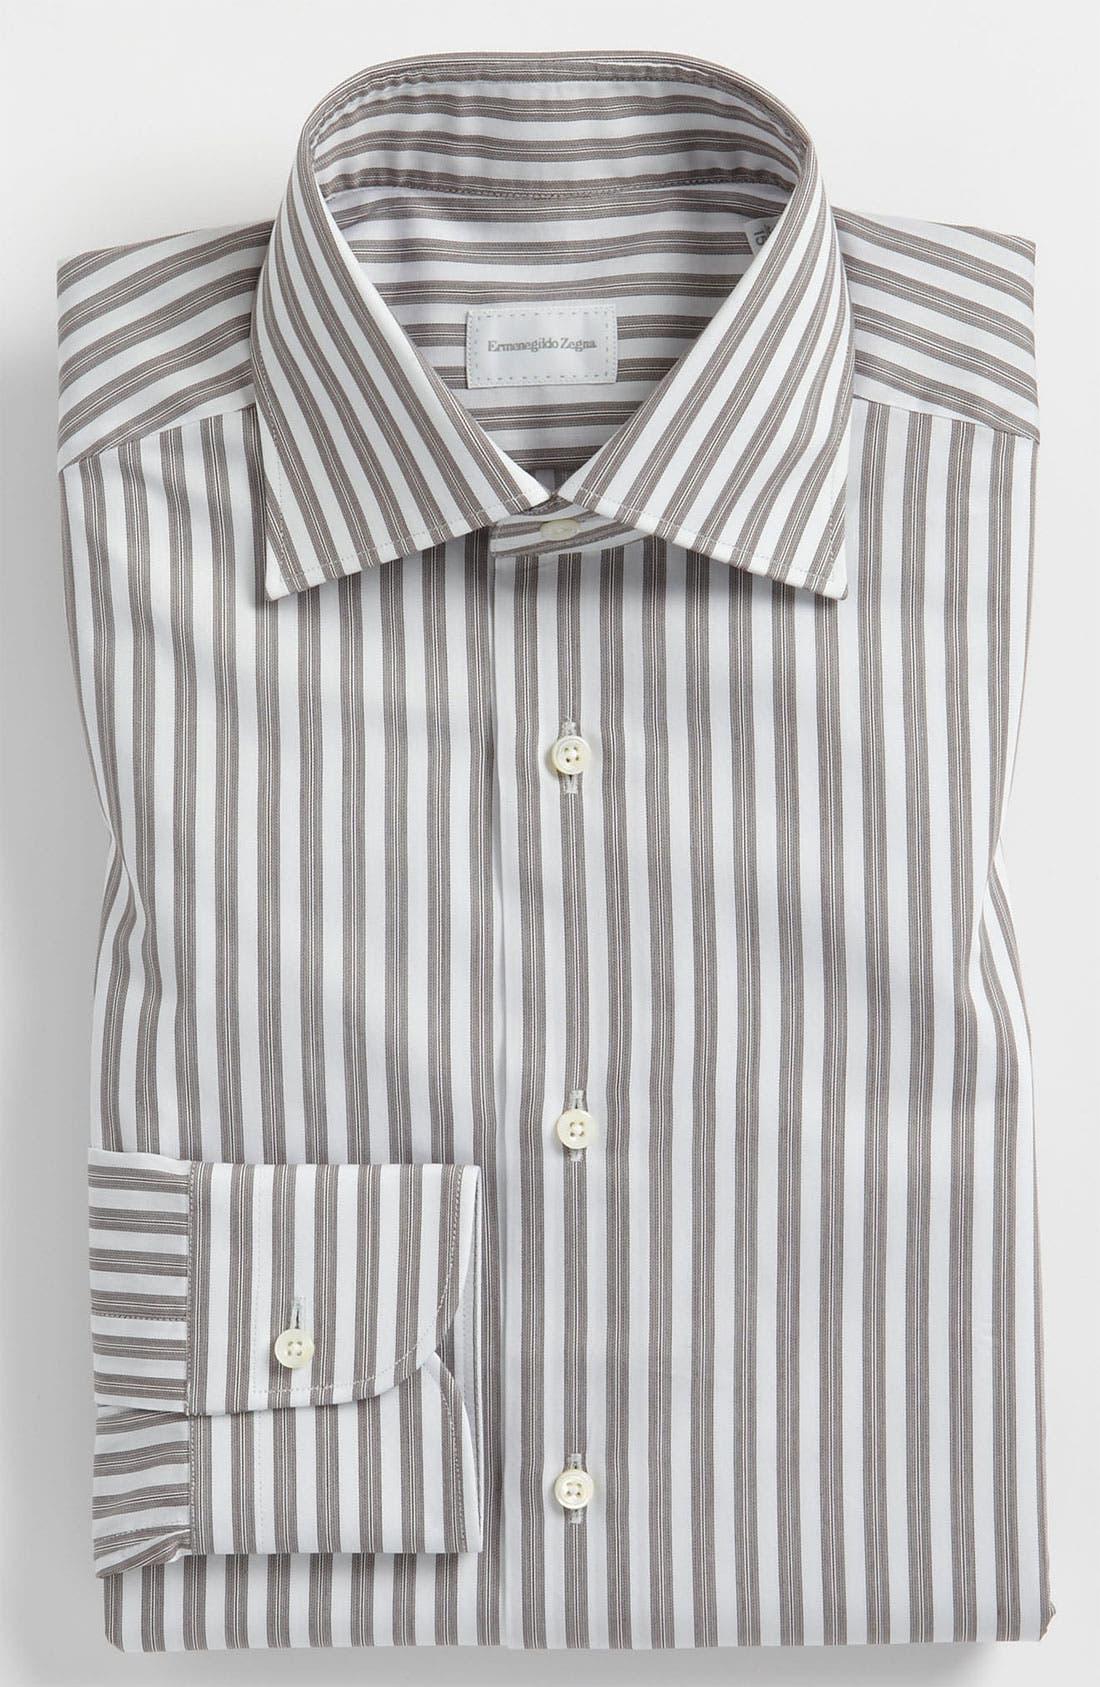 Alternate Image 1 Selected - Ermenegildo Zegna Regular Fit Dress Shirt